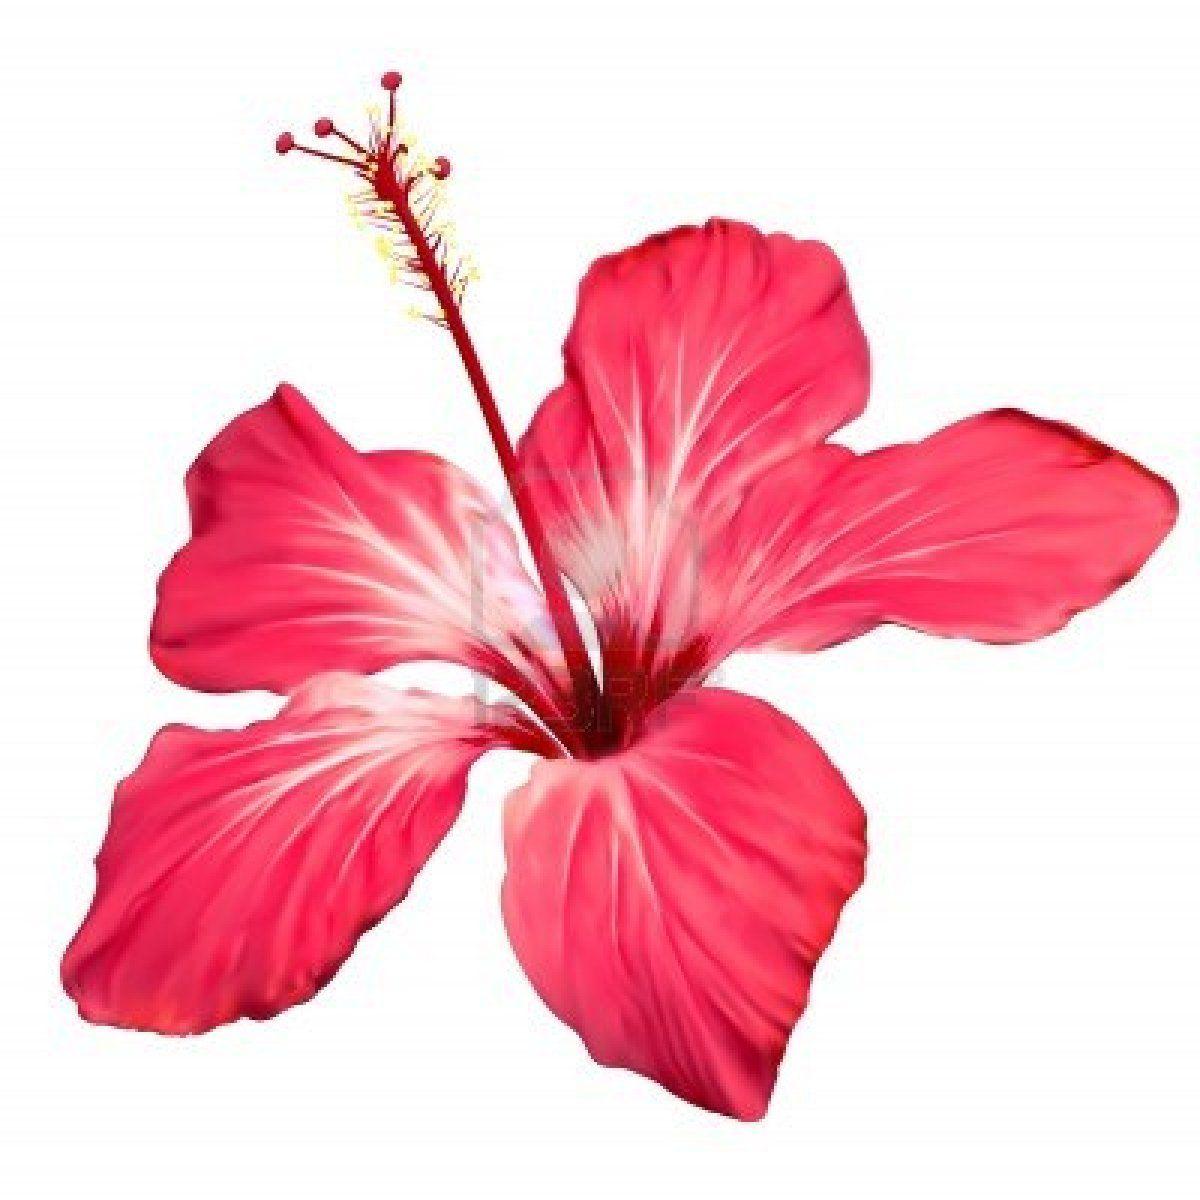 Hibiscus Flower Border Clip Art - ClipArt Best | Flowers ...